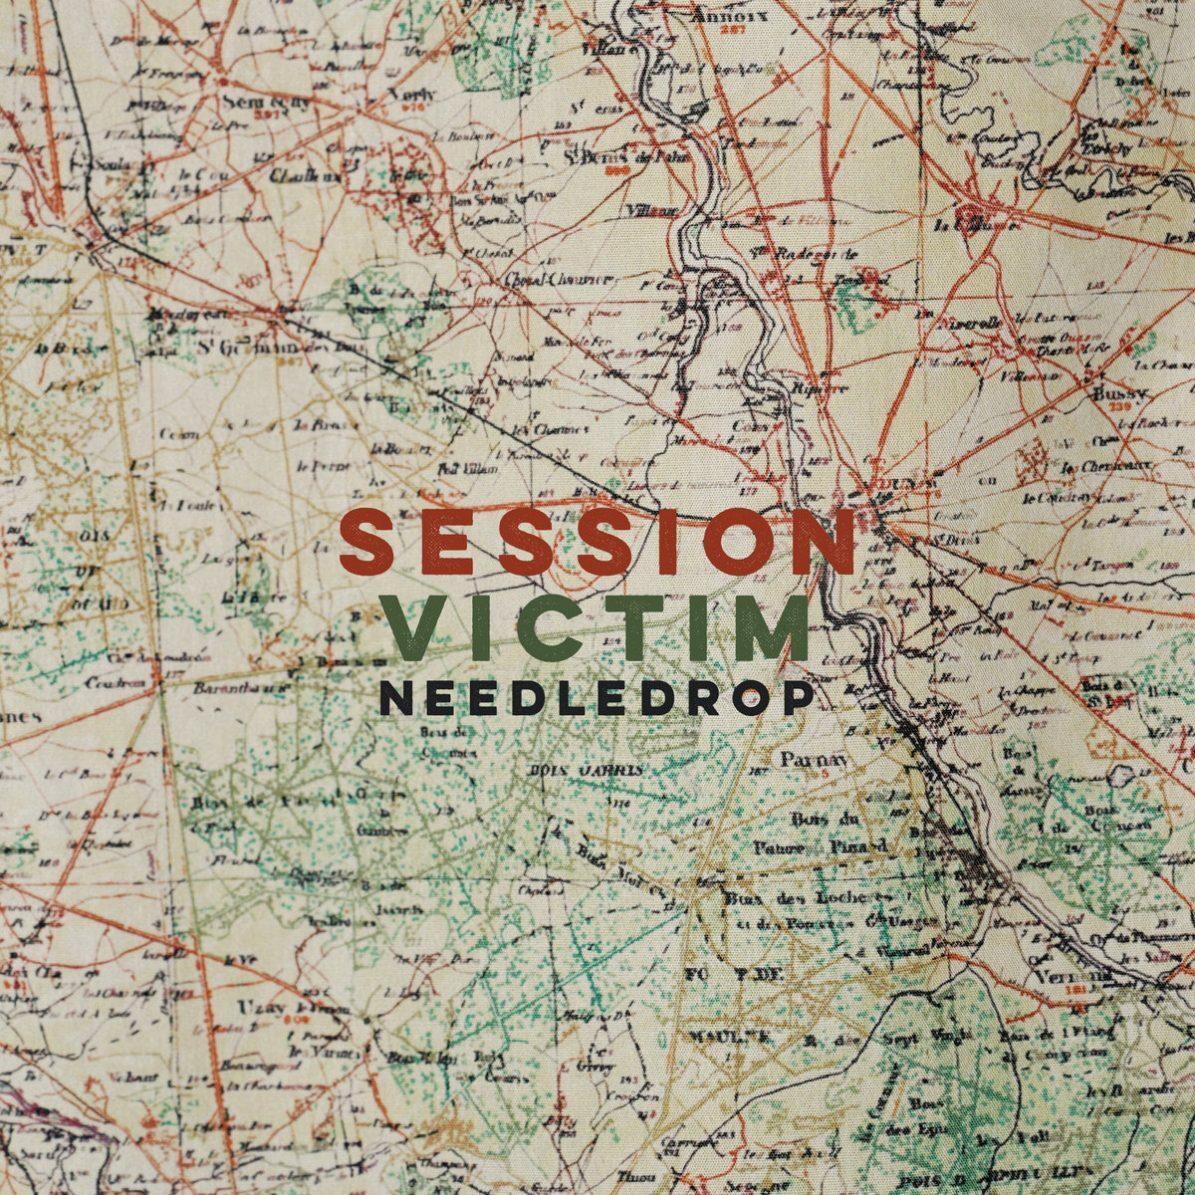 Session Victim — Needledrop (LateNightTales, 2020)